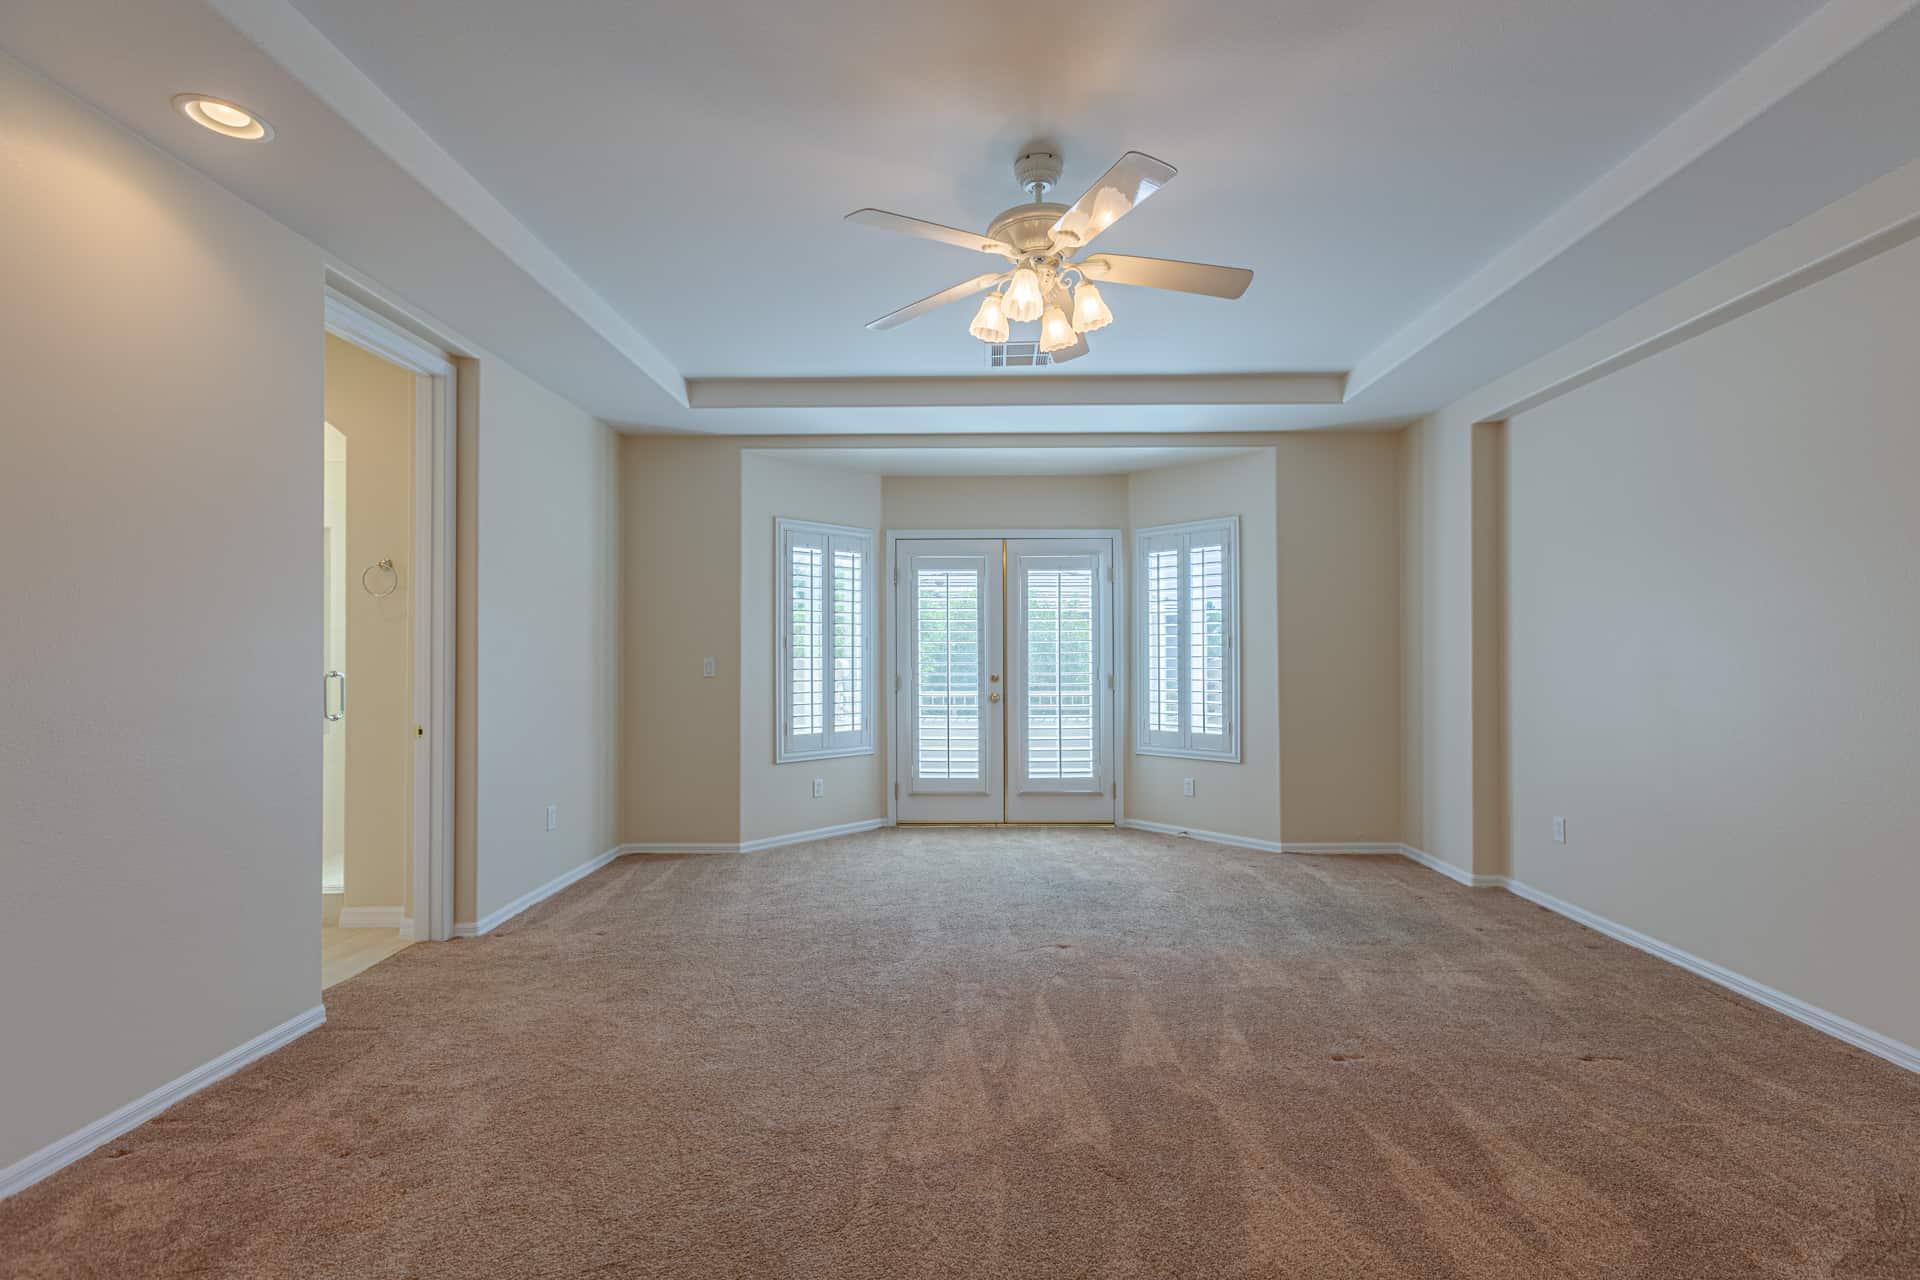 las-vegas-luxry-real-estate-realtor-rob-jensen-company-10729-grey-havens-court-willow-creek3157